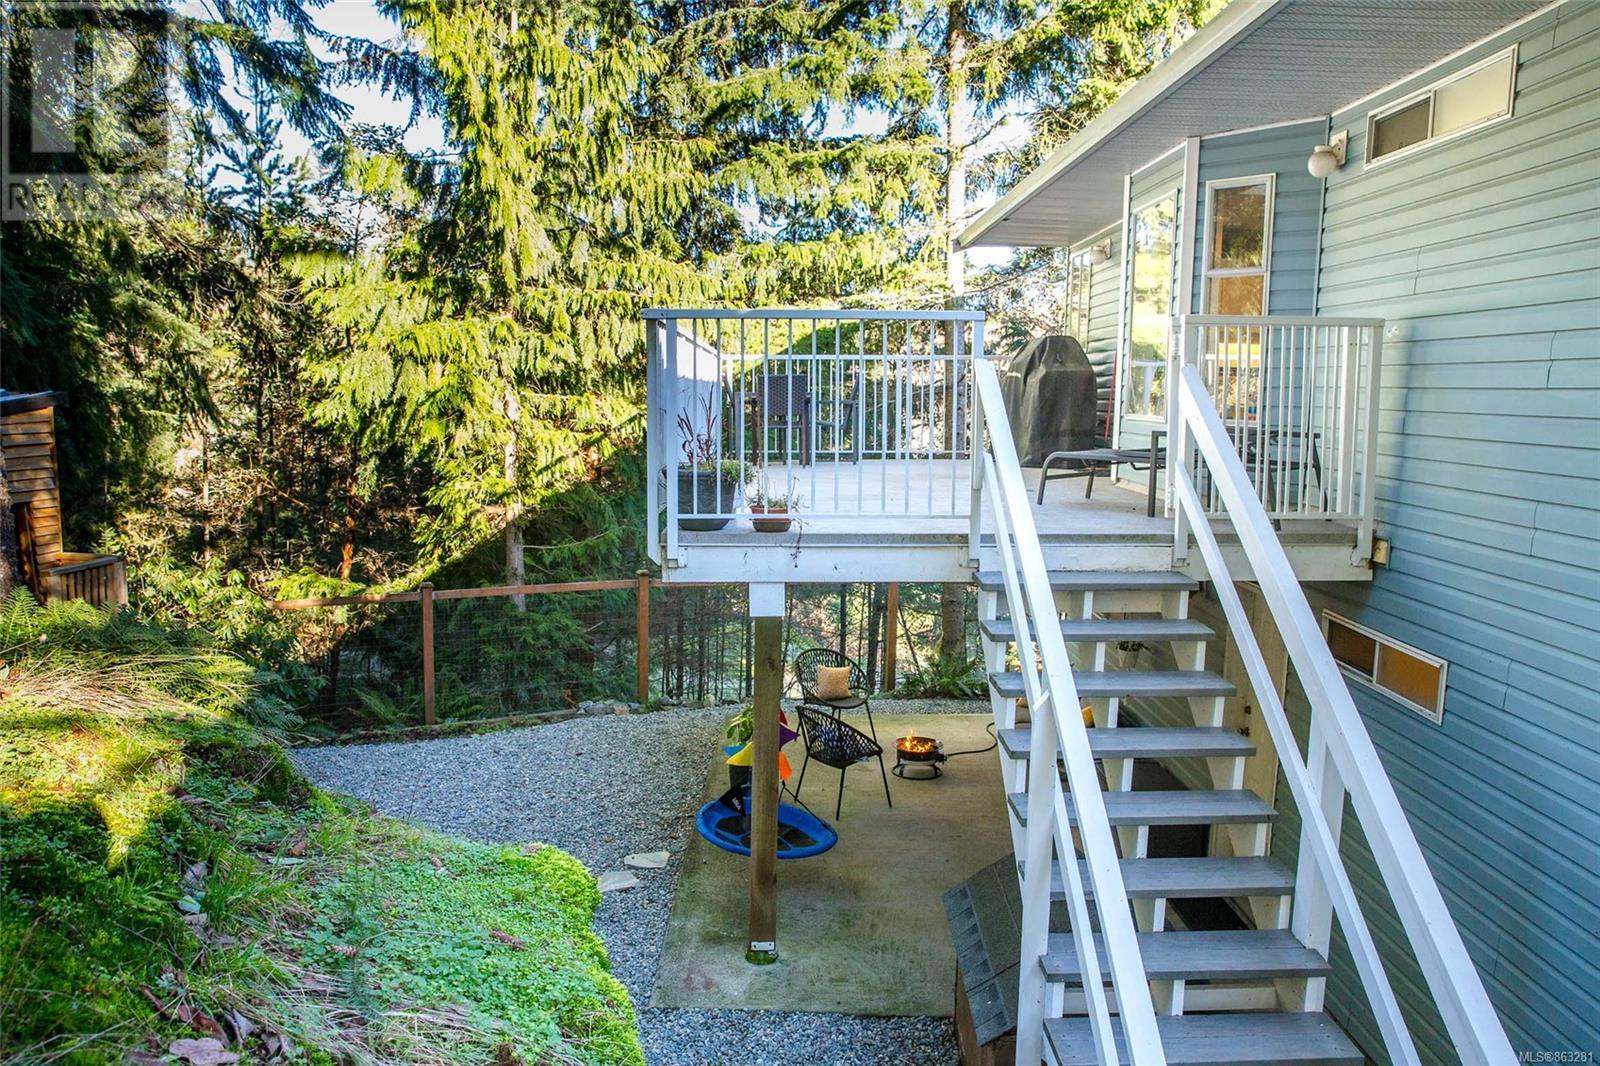 3750 Myrta Pl, Nanaimo, British Columbia  V9T 5R5 - Photo 13 - 863281